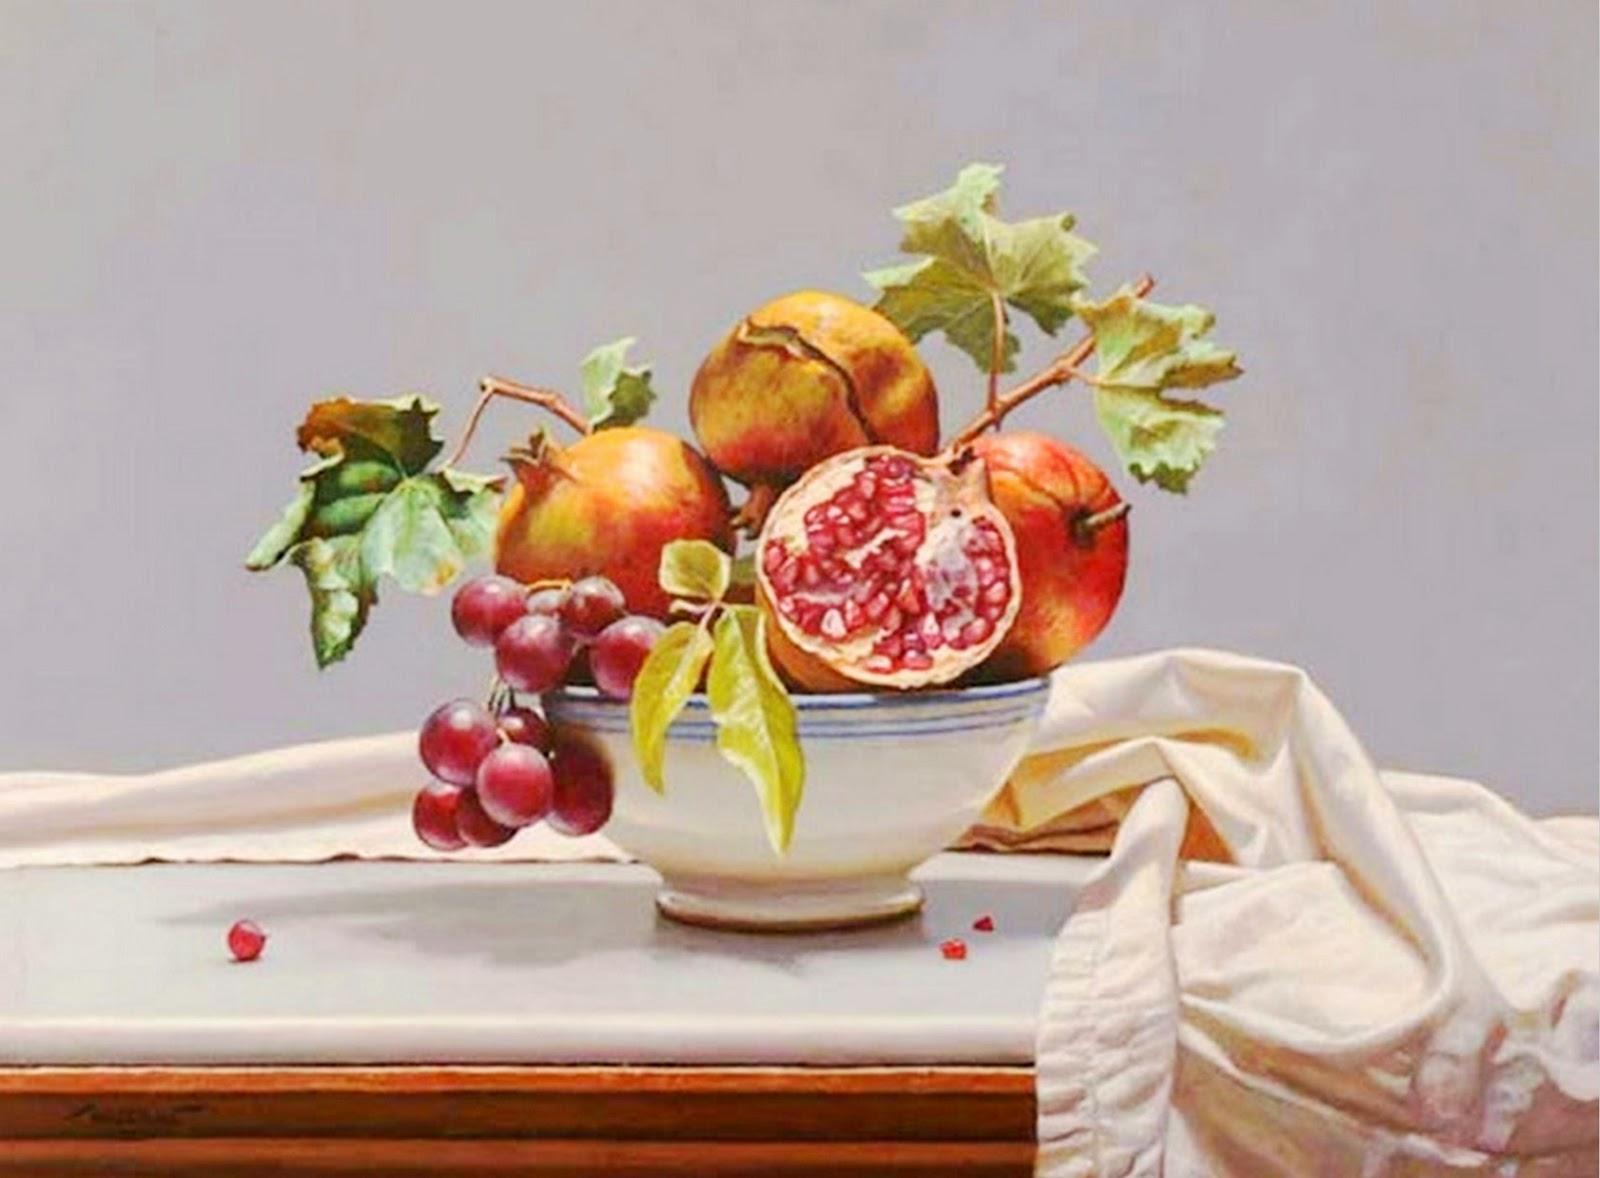 cuadros pintados al oleo para comedor - 28 images - cuadros pintados ...